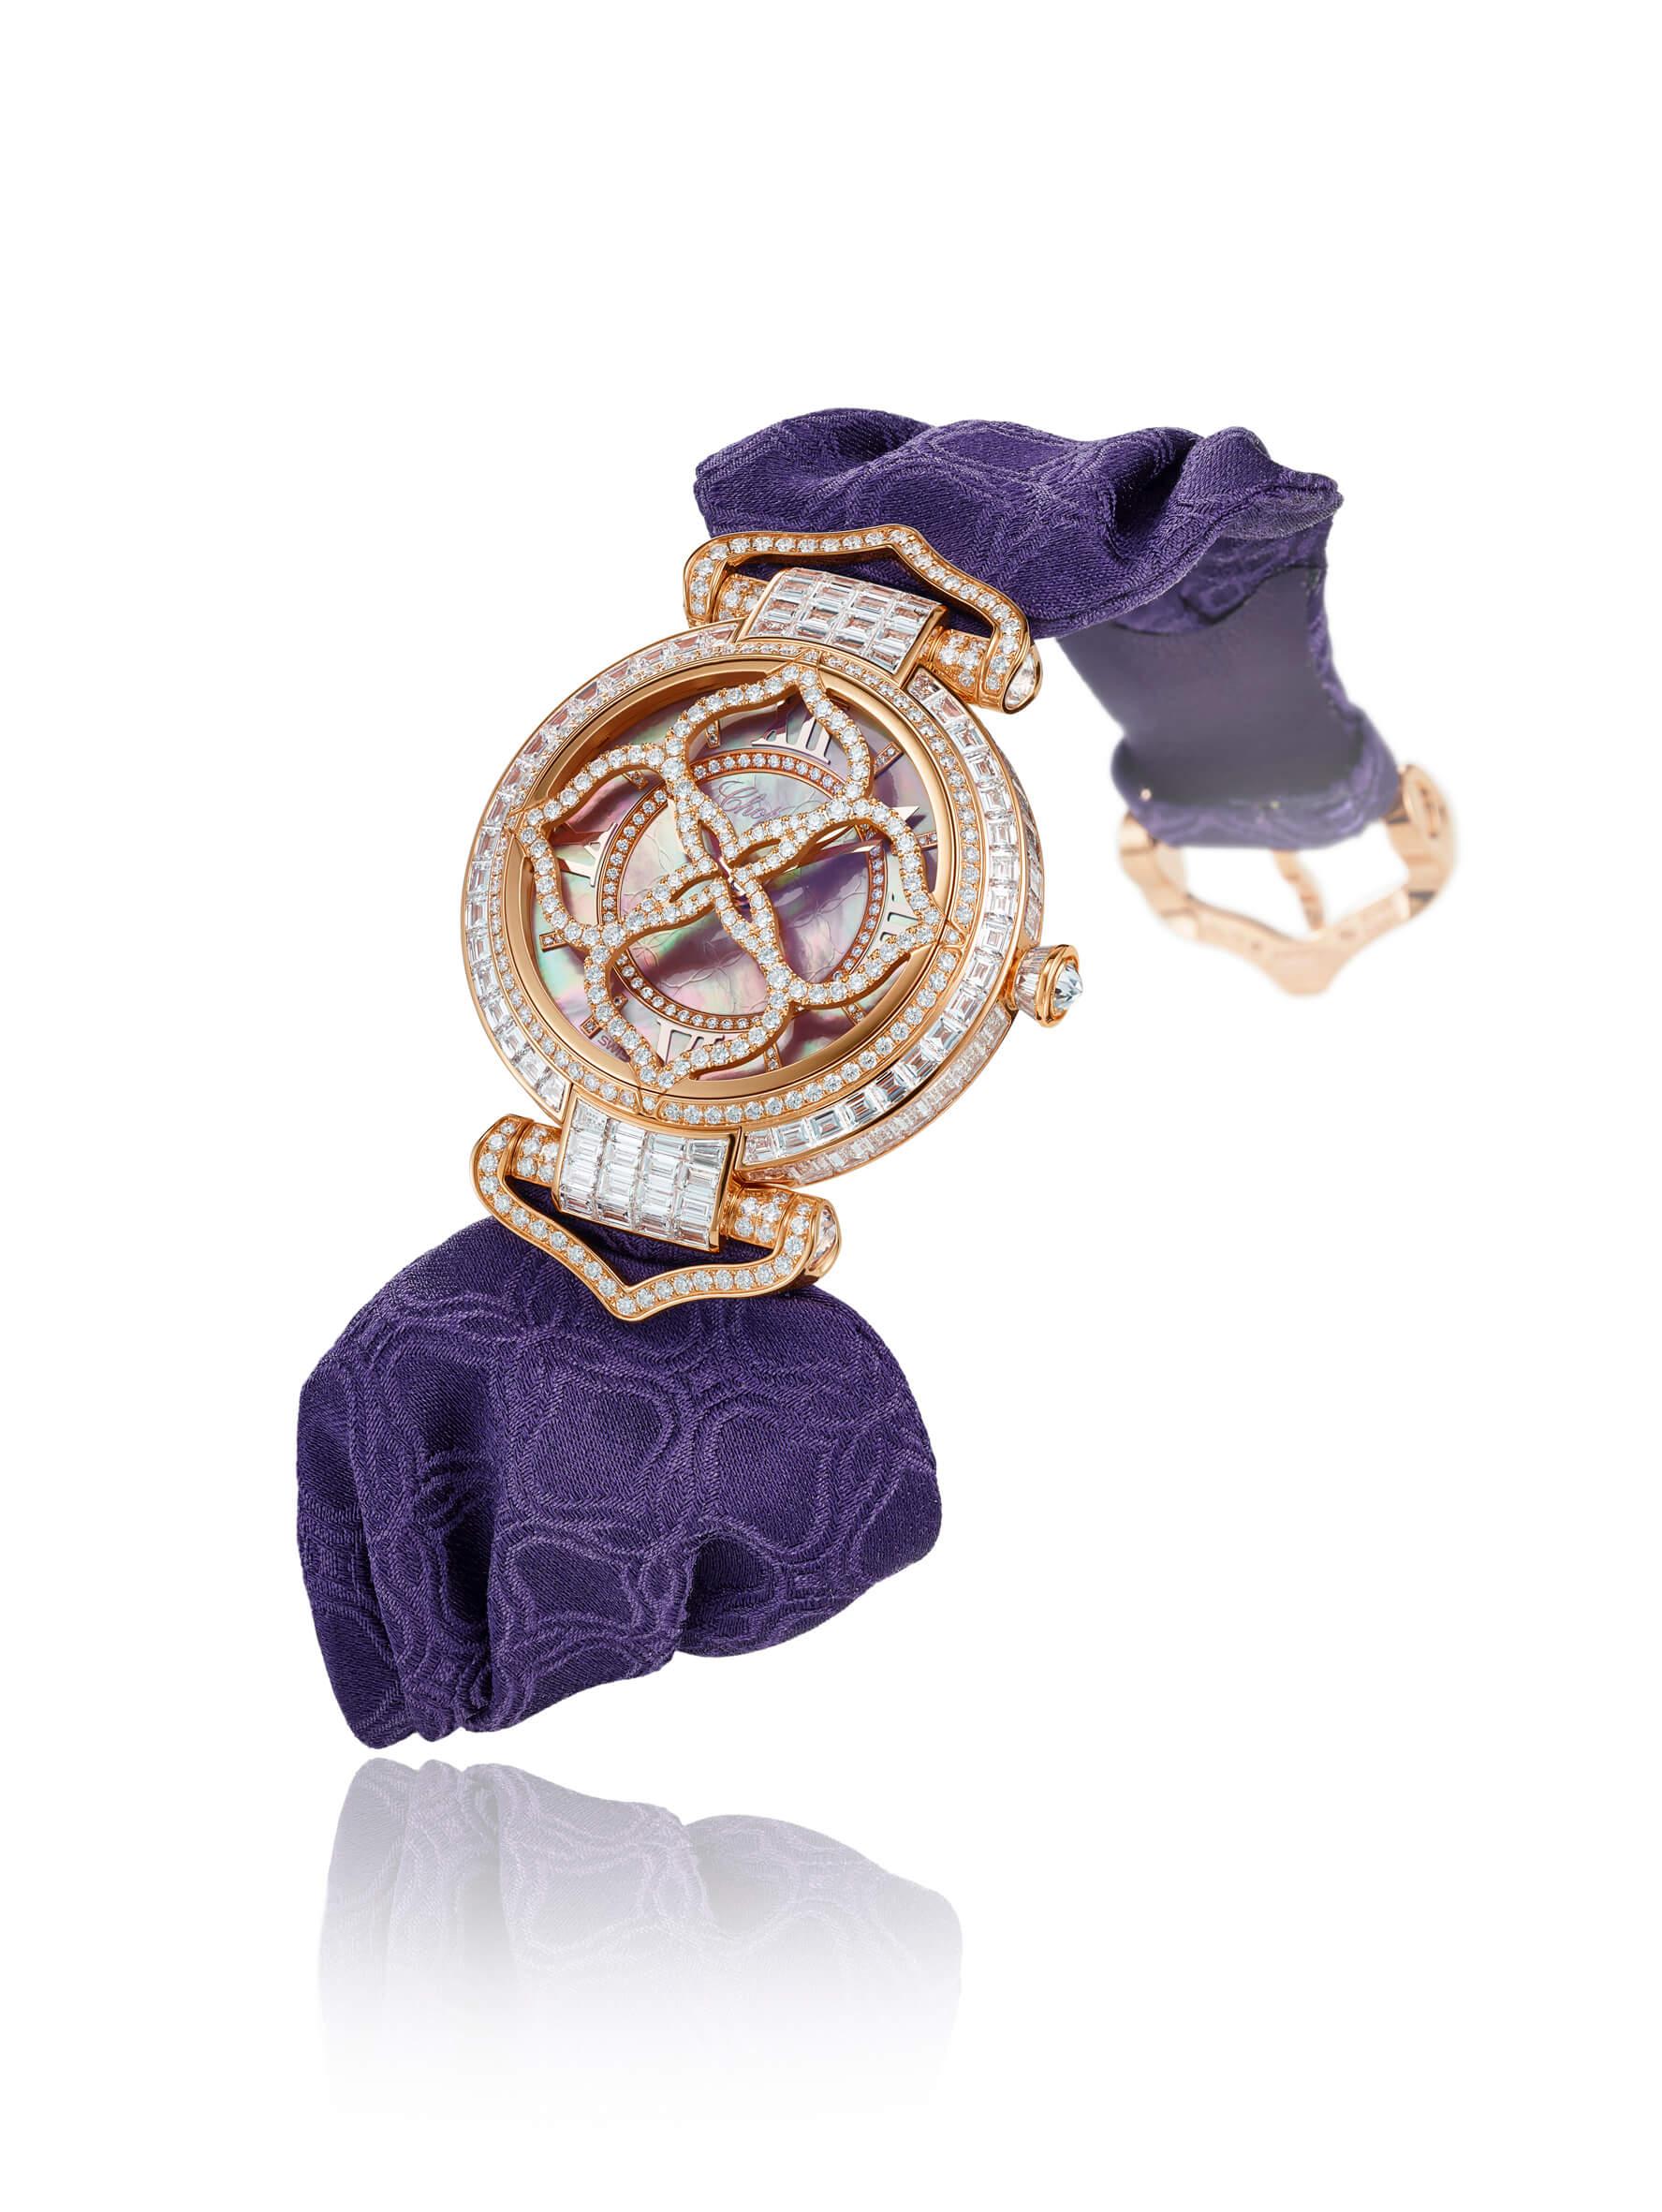 Las joyas Imperiale Chopard - Reloj imperiale